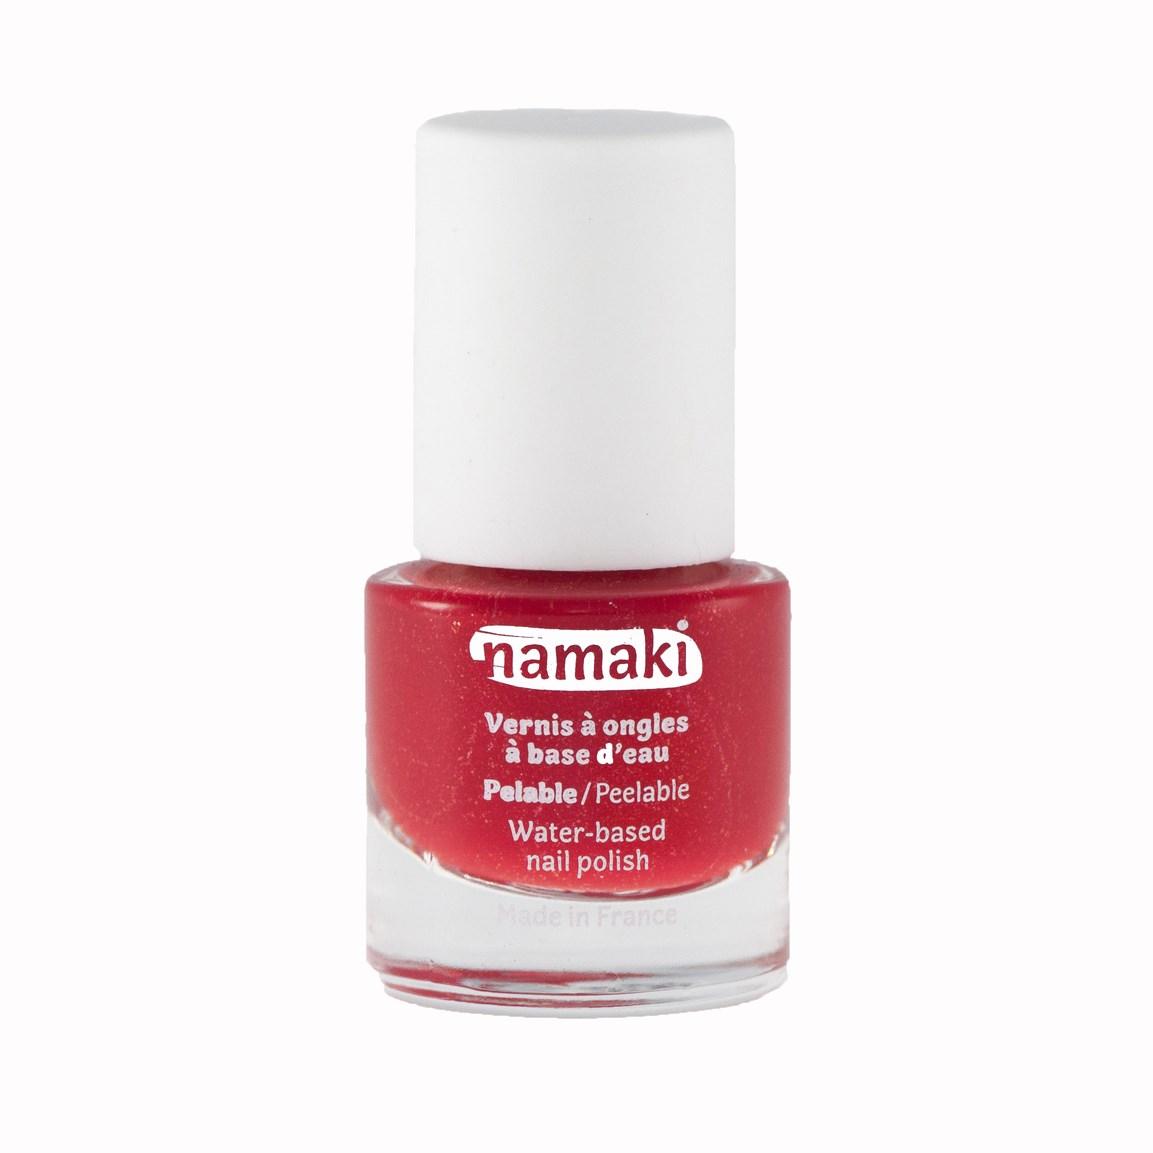 Doux Good - Vernis à ongles Namaki 11 Griotte